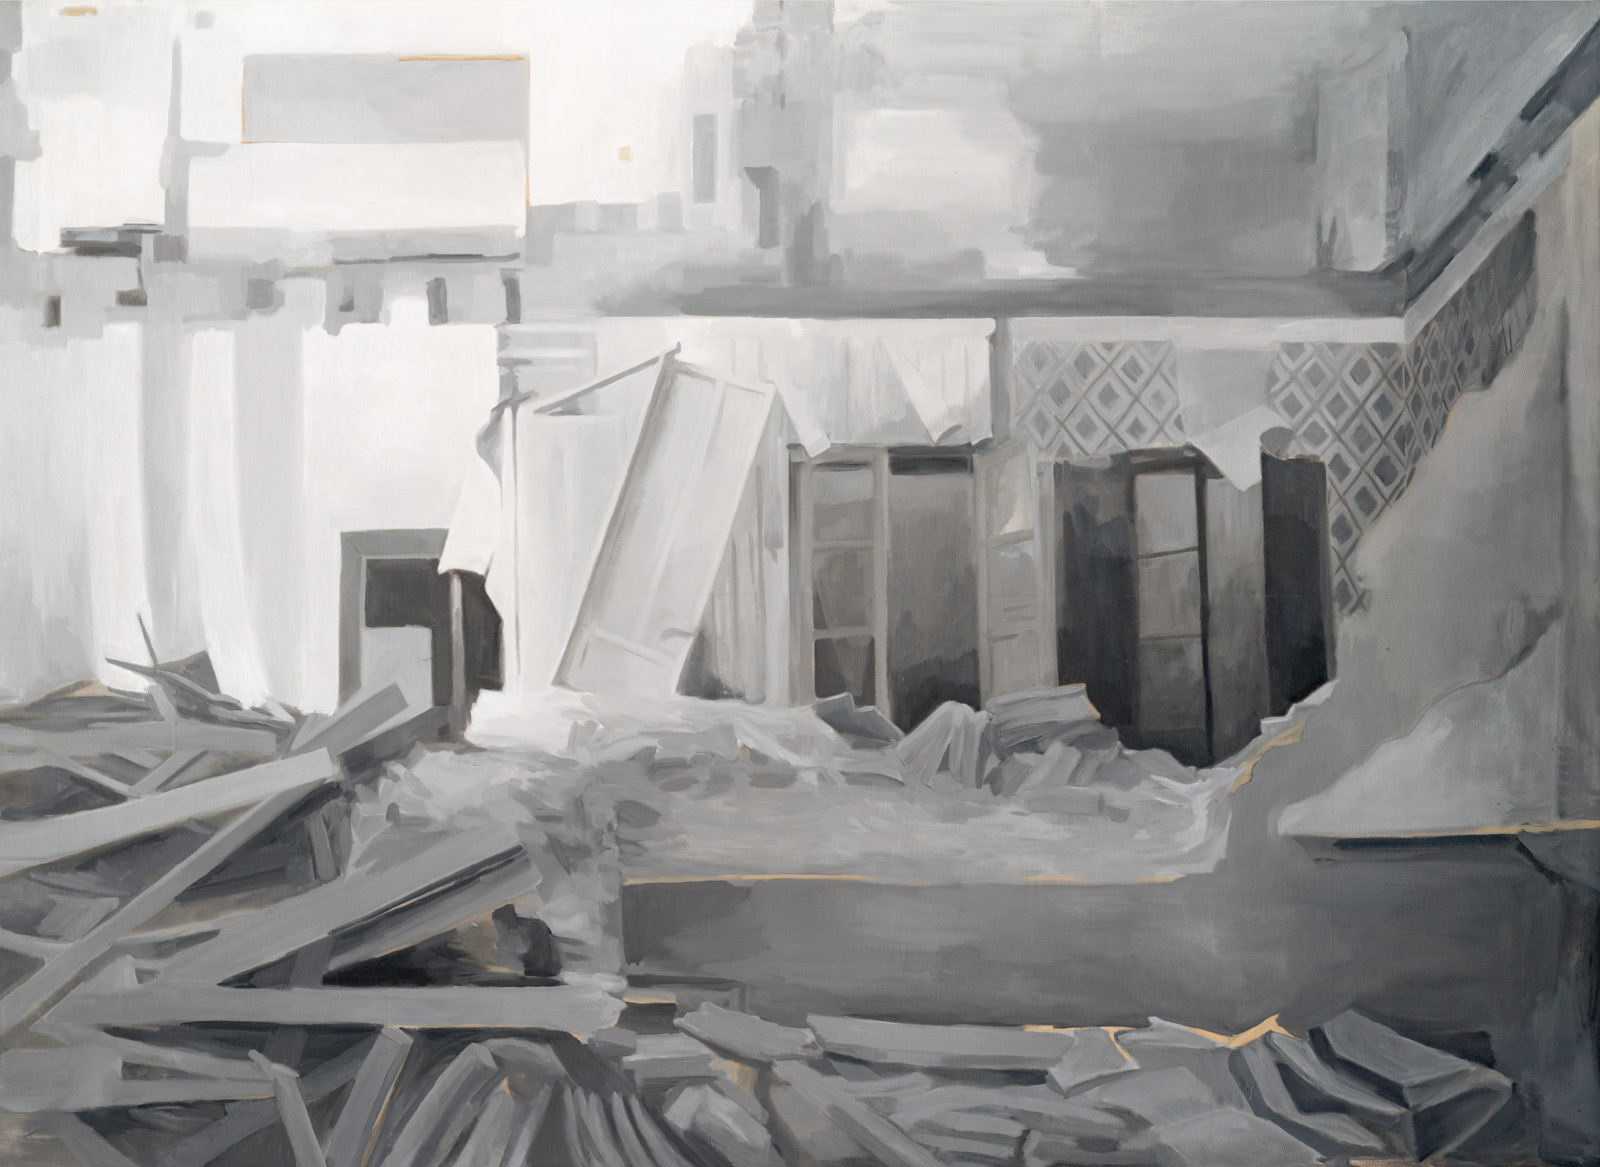 Salomé del Campo, Derribo IV, 2003